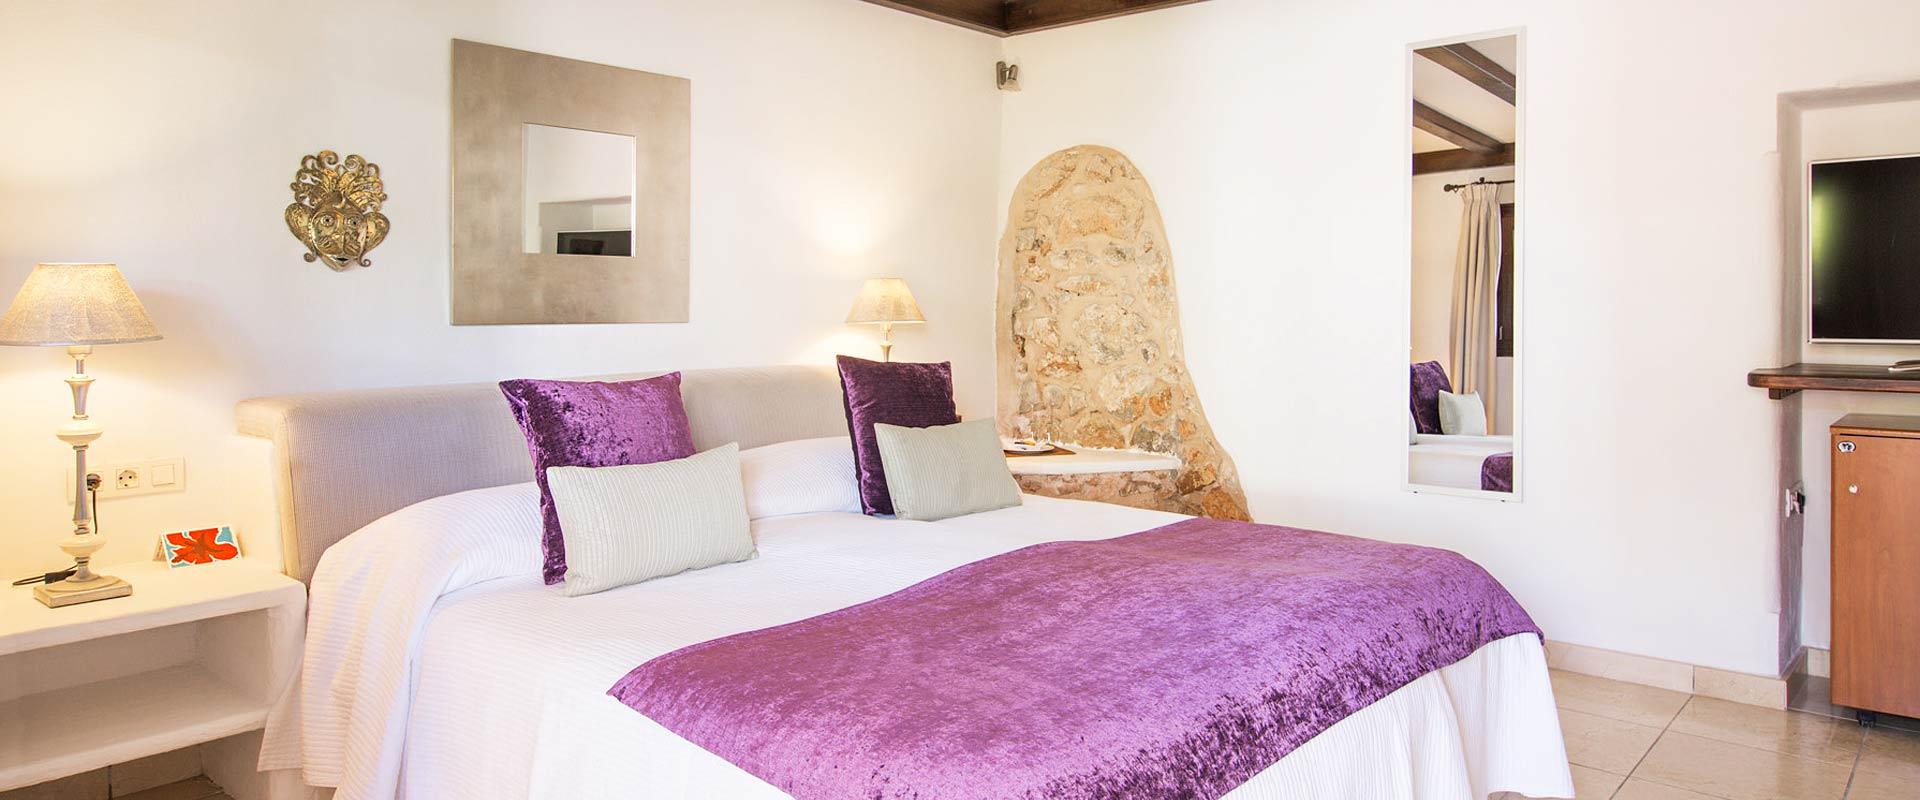 Residencia Casa Munich Ibiza  Bienvenidos a Casa Munich Ibiza